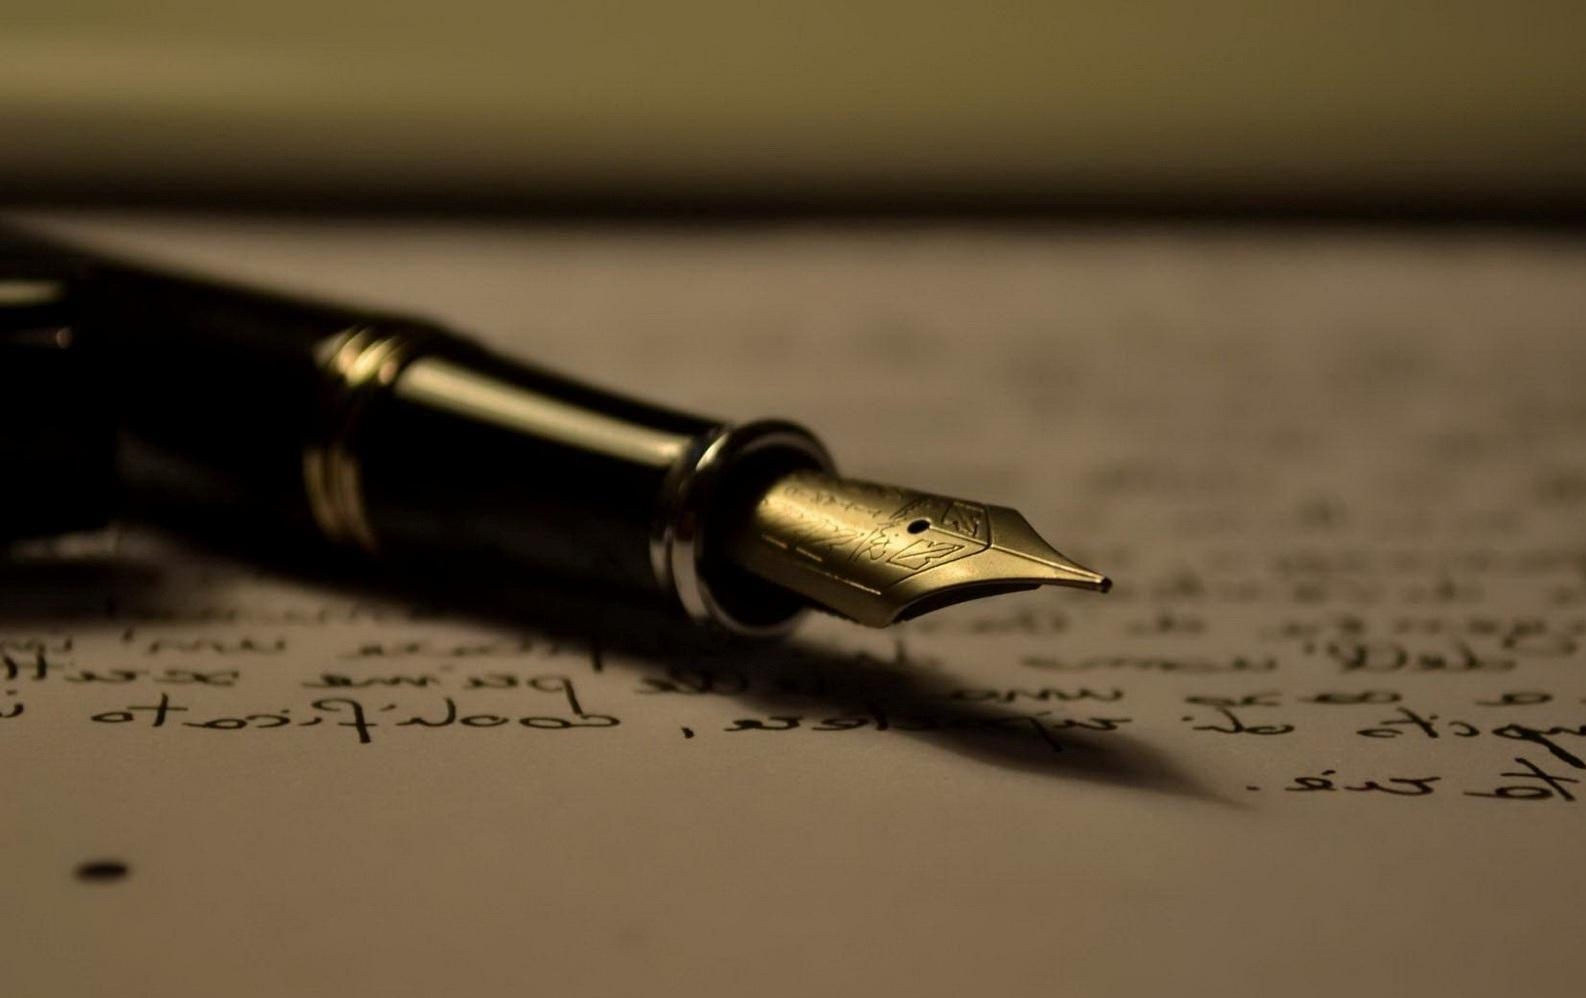 ink pen 1